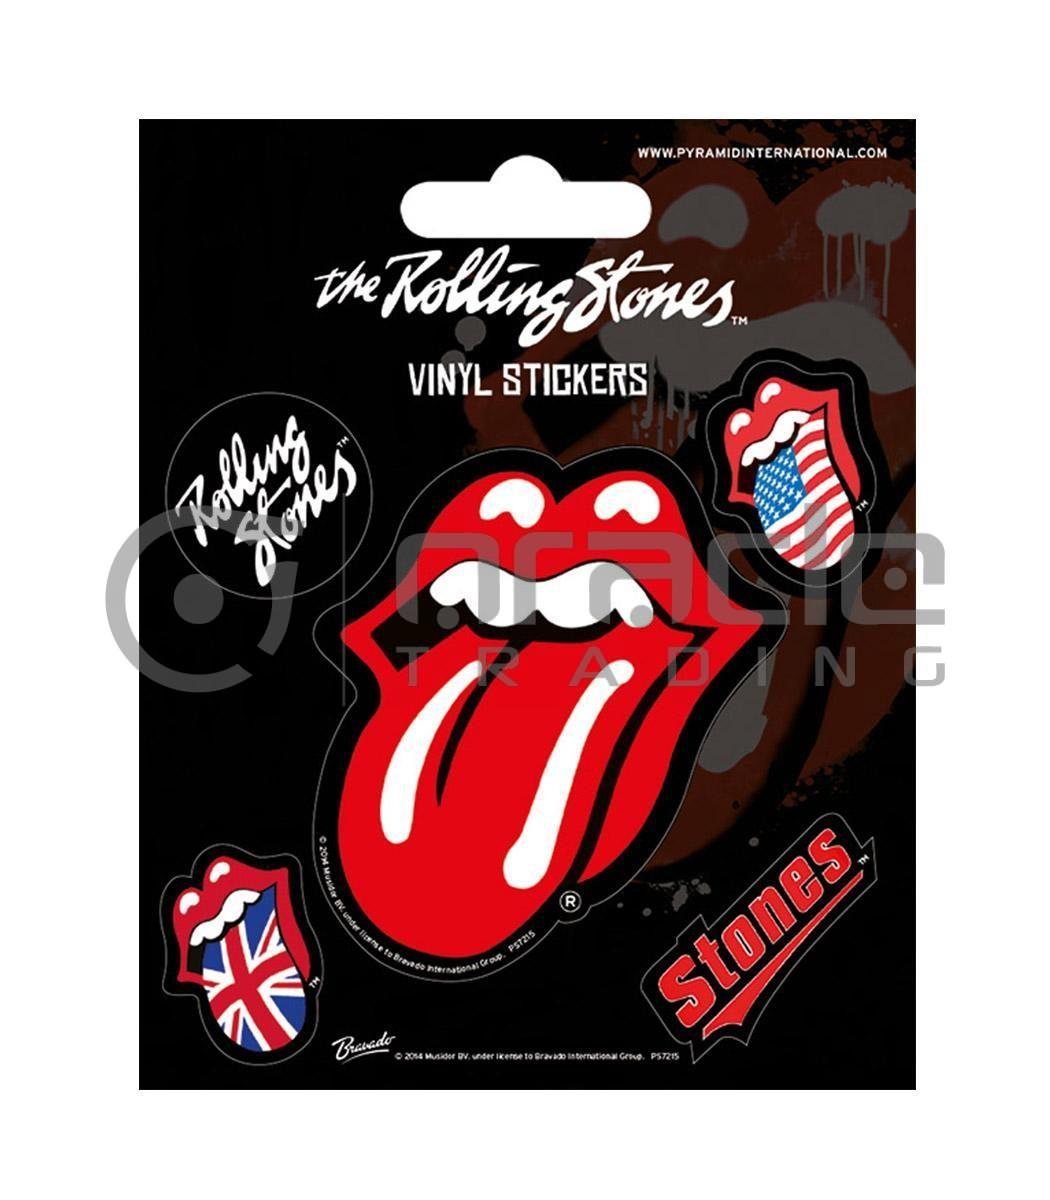 Rolling Stones Vinyl Sticker Pack